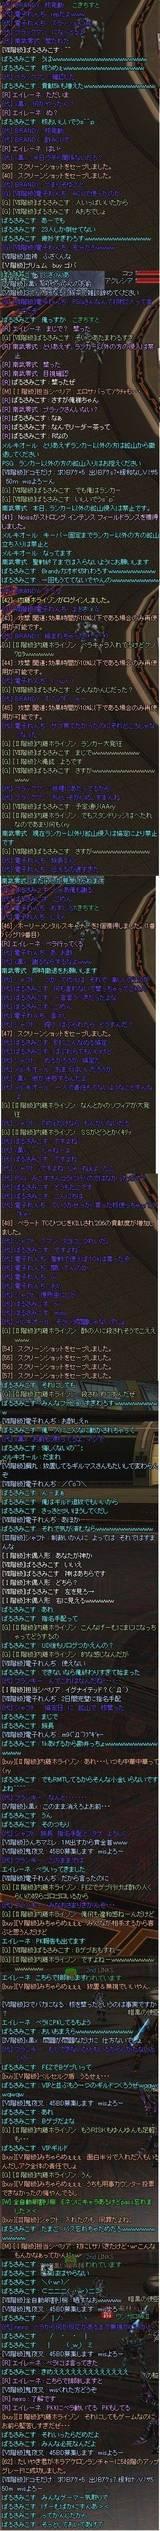 bfe872f7.jpg